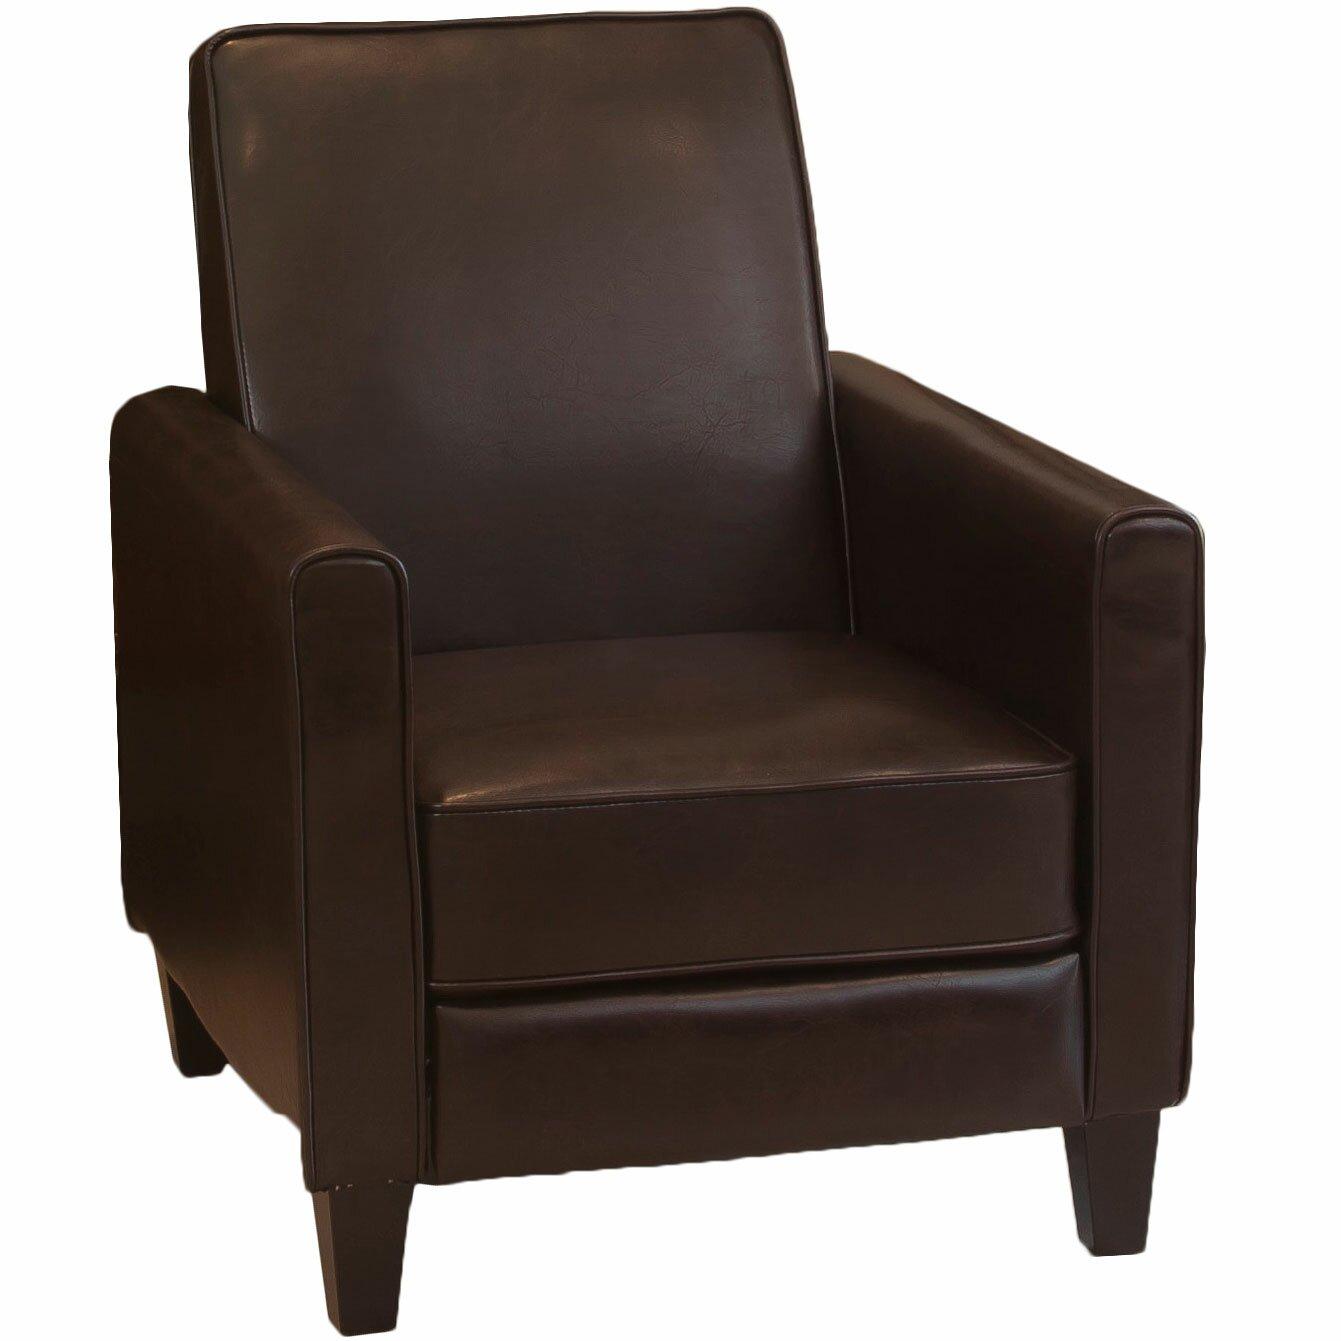 Zipcode design lana reclining club chair reviews for Recliner chair